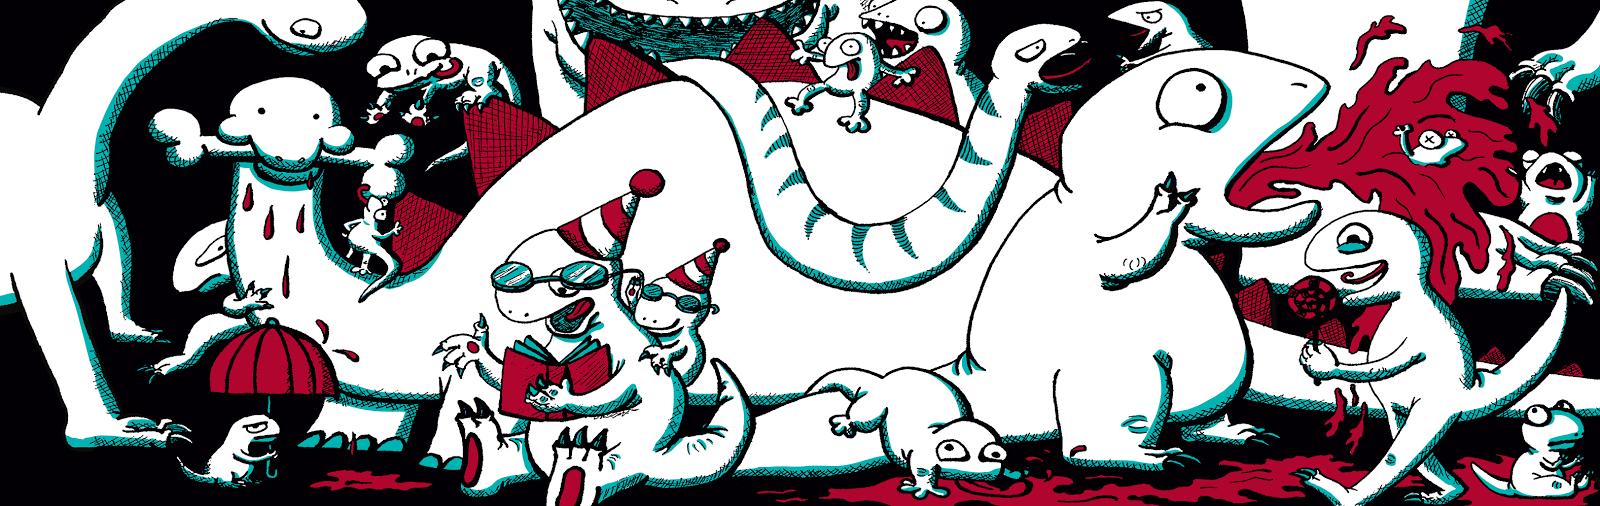 Dino Doodles - Jen Haugan Animation & Illustration